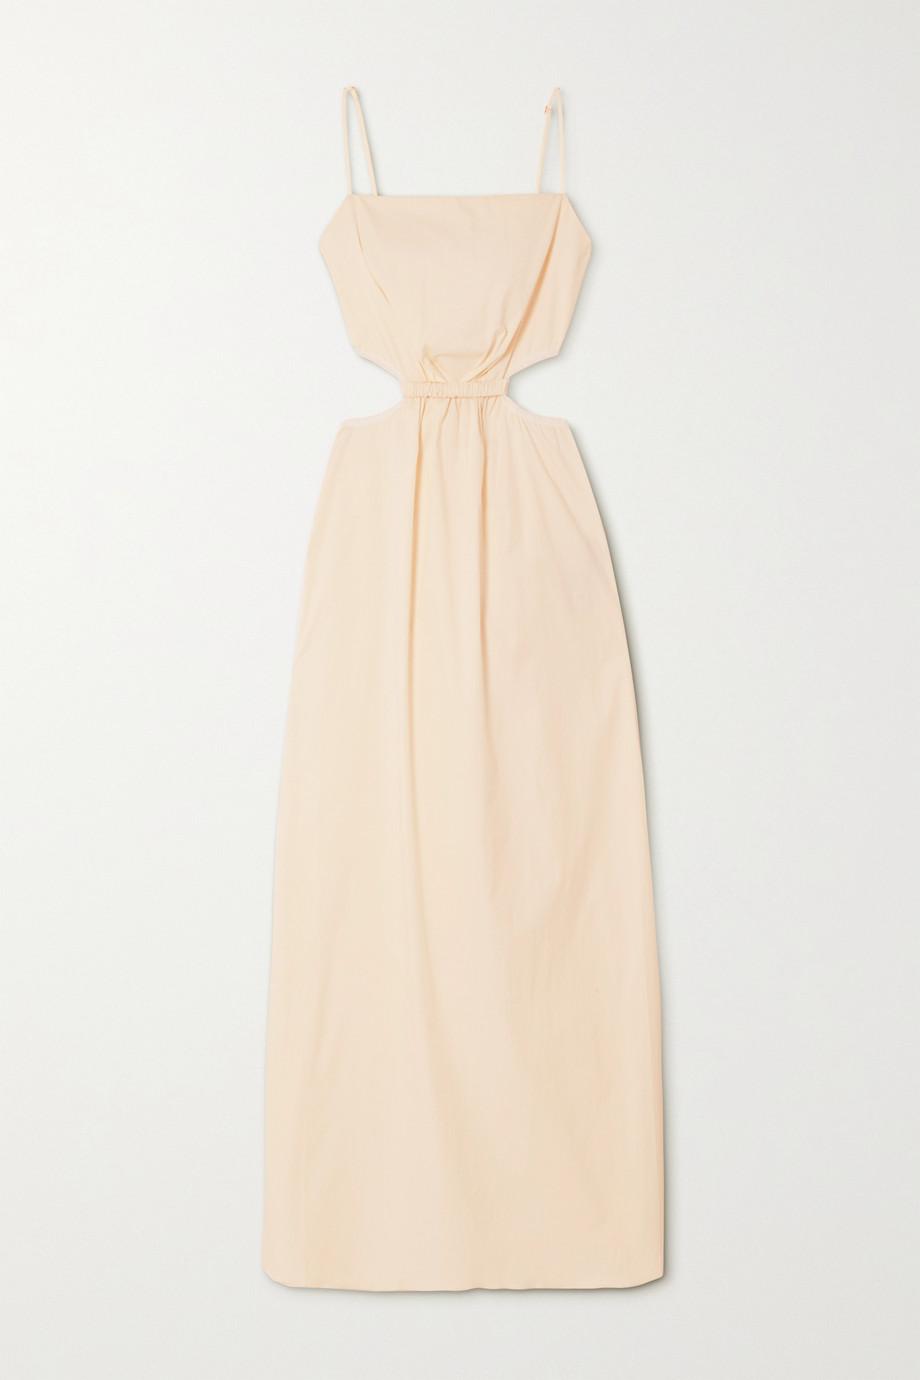 Johanna Ortiz White Sand cutout cotton-blend maxi dress